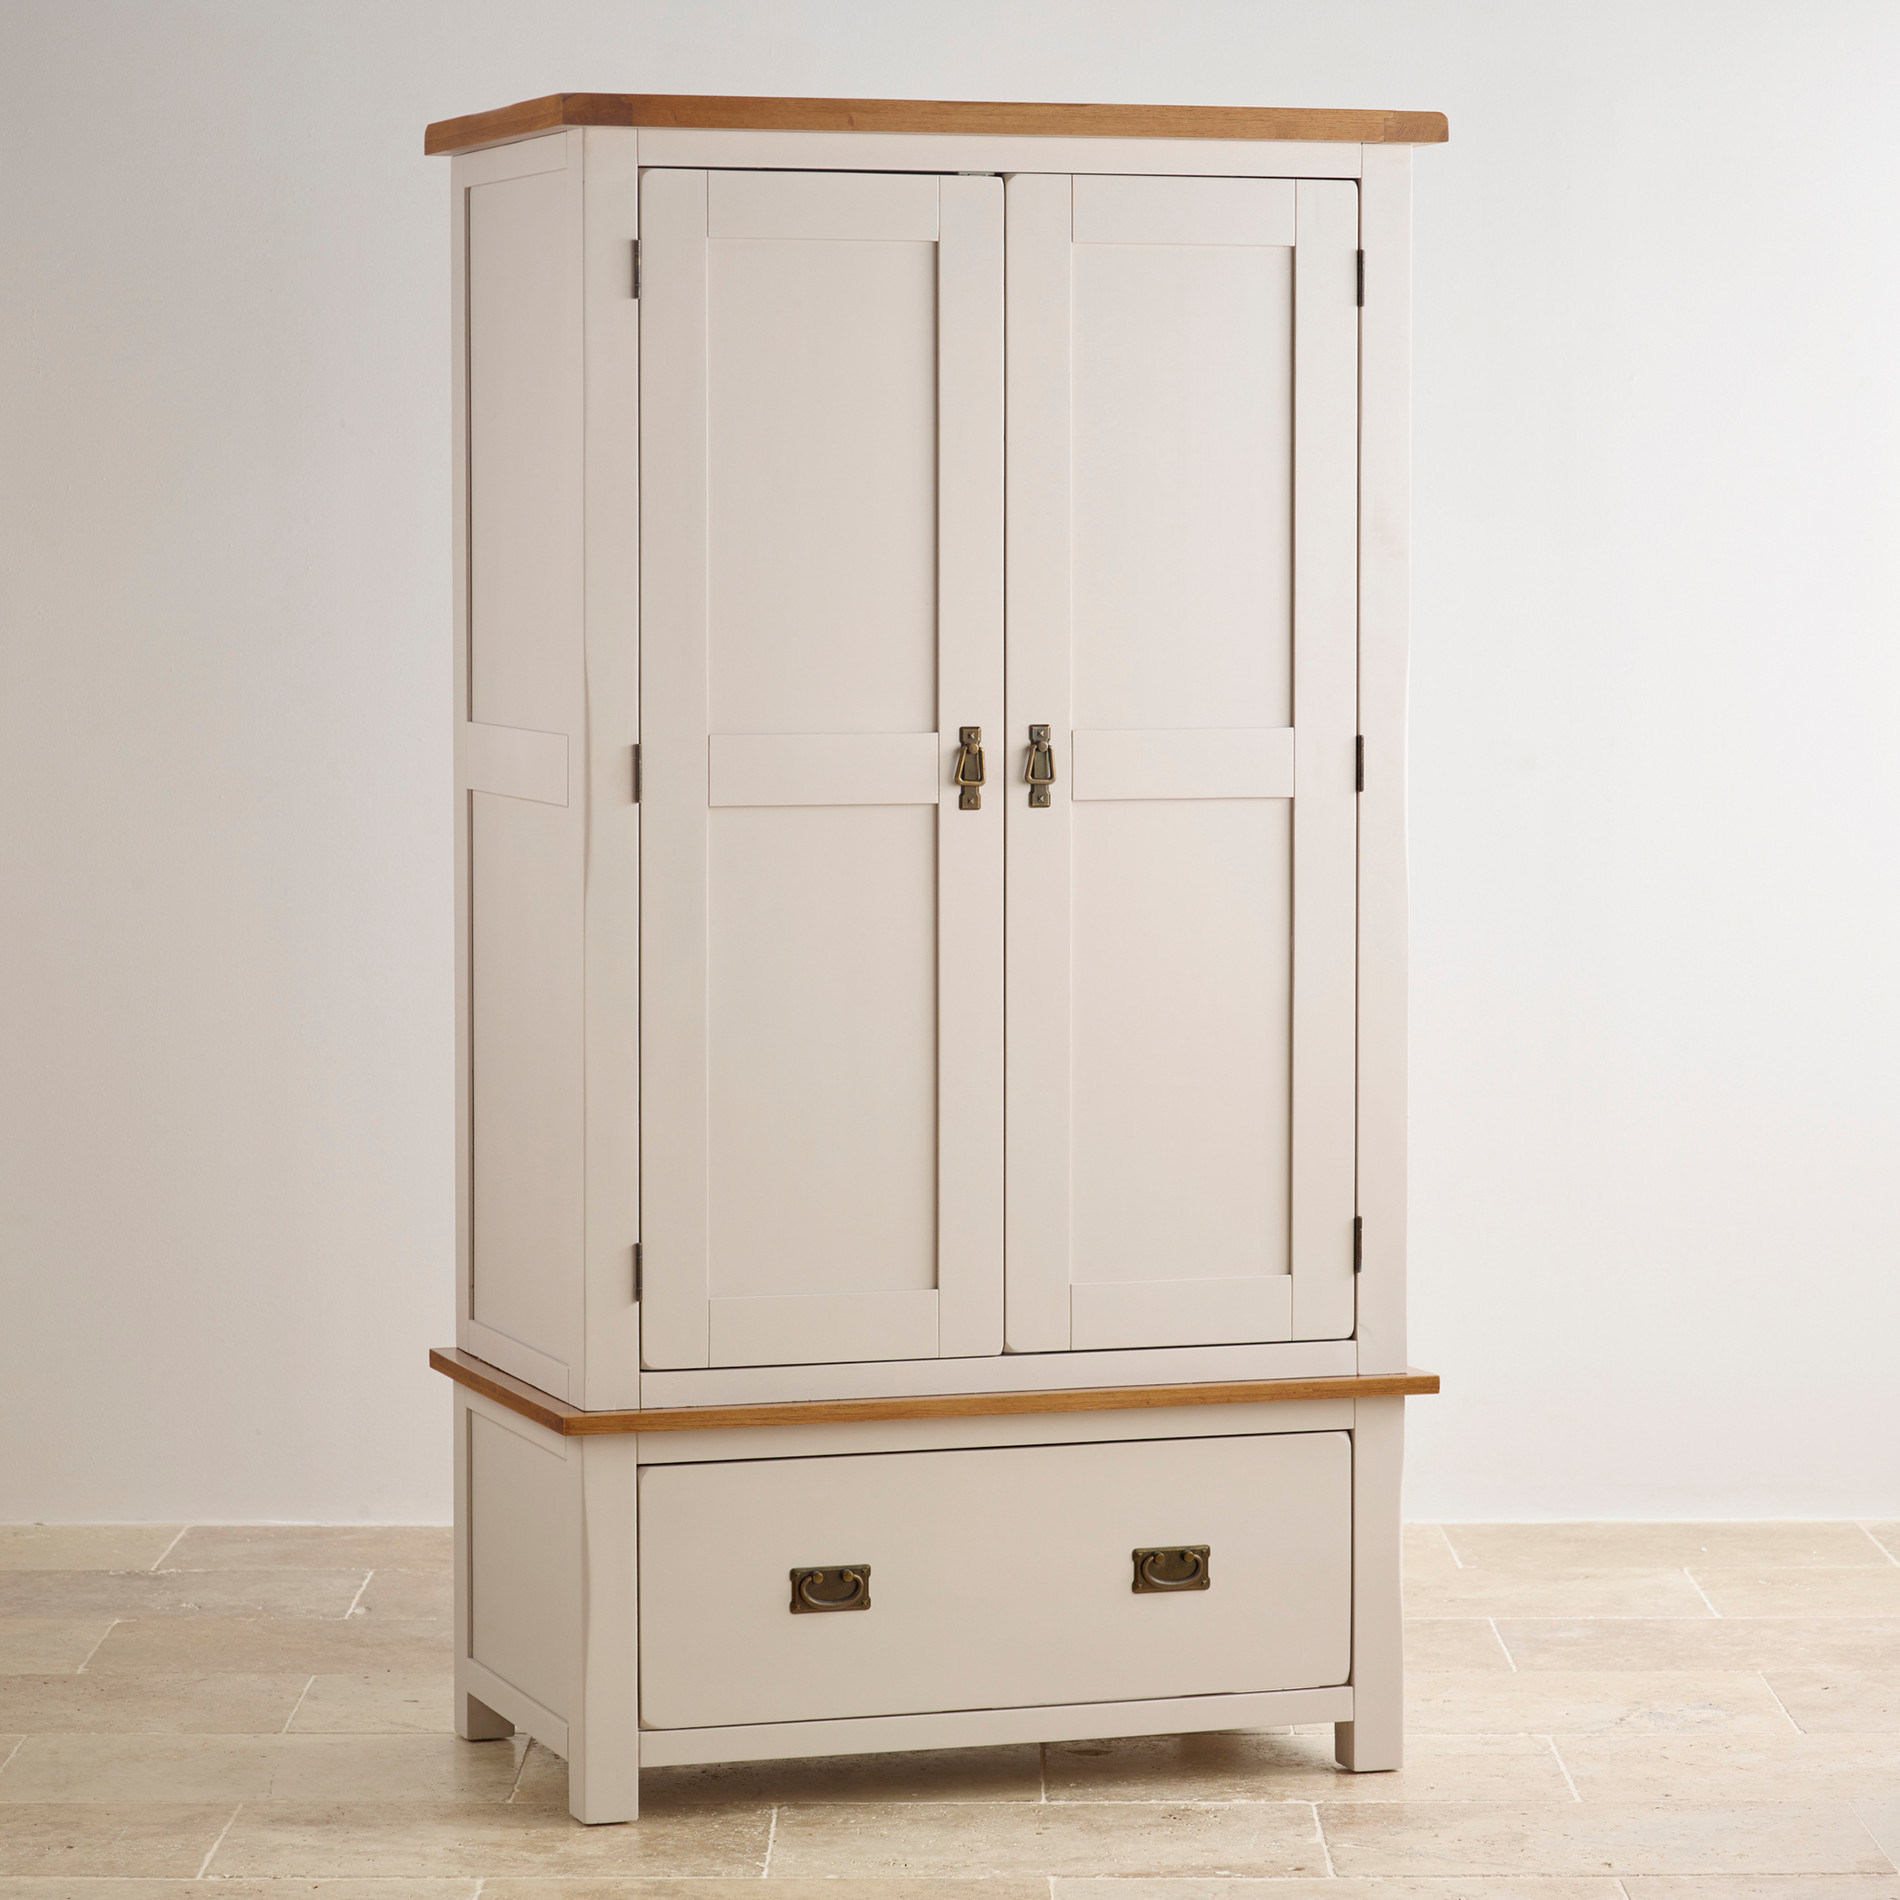 Peint En Blanc Chambre Moderne En Bois Massif De Chêne 2 Portes Avec Tiroir  Armoire Penderie